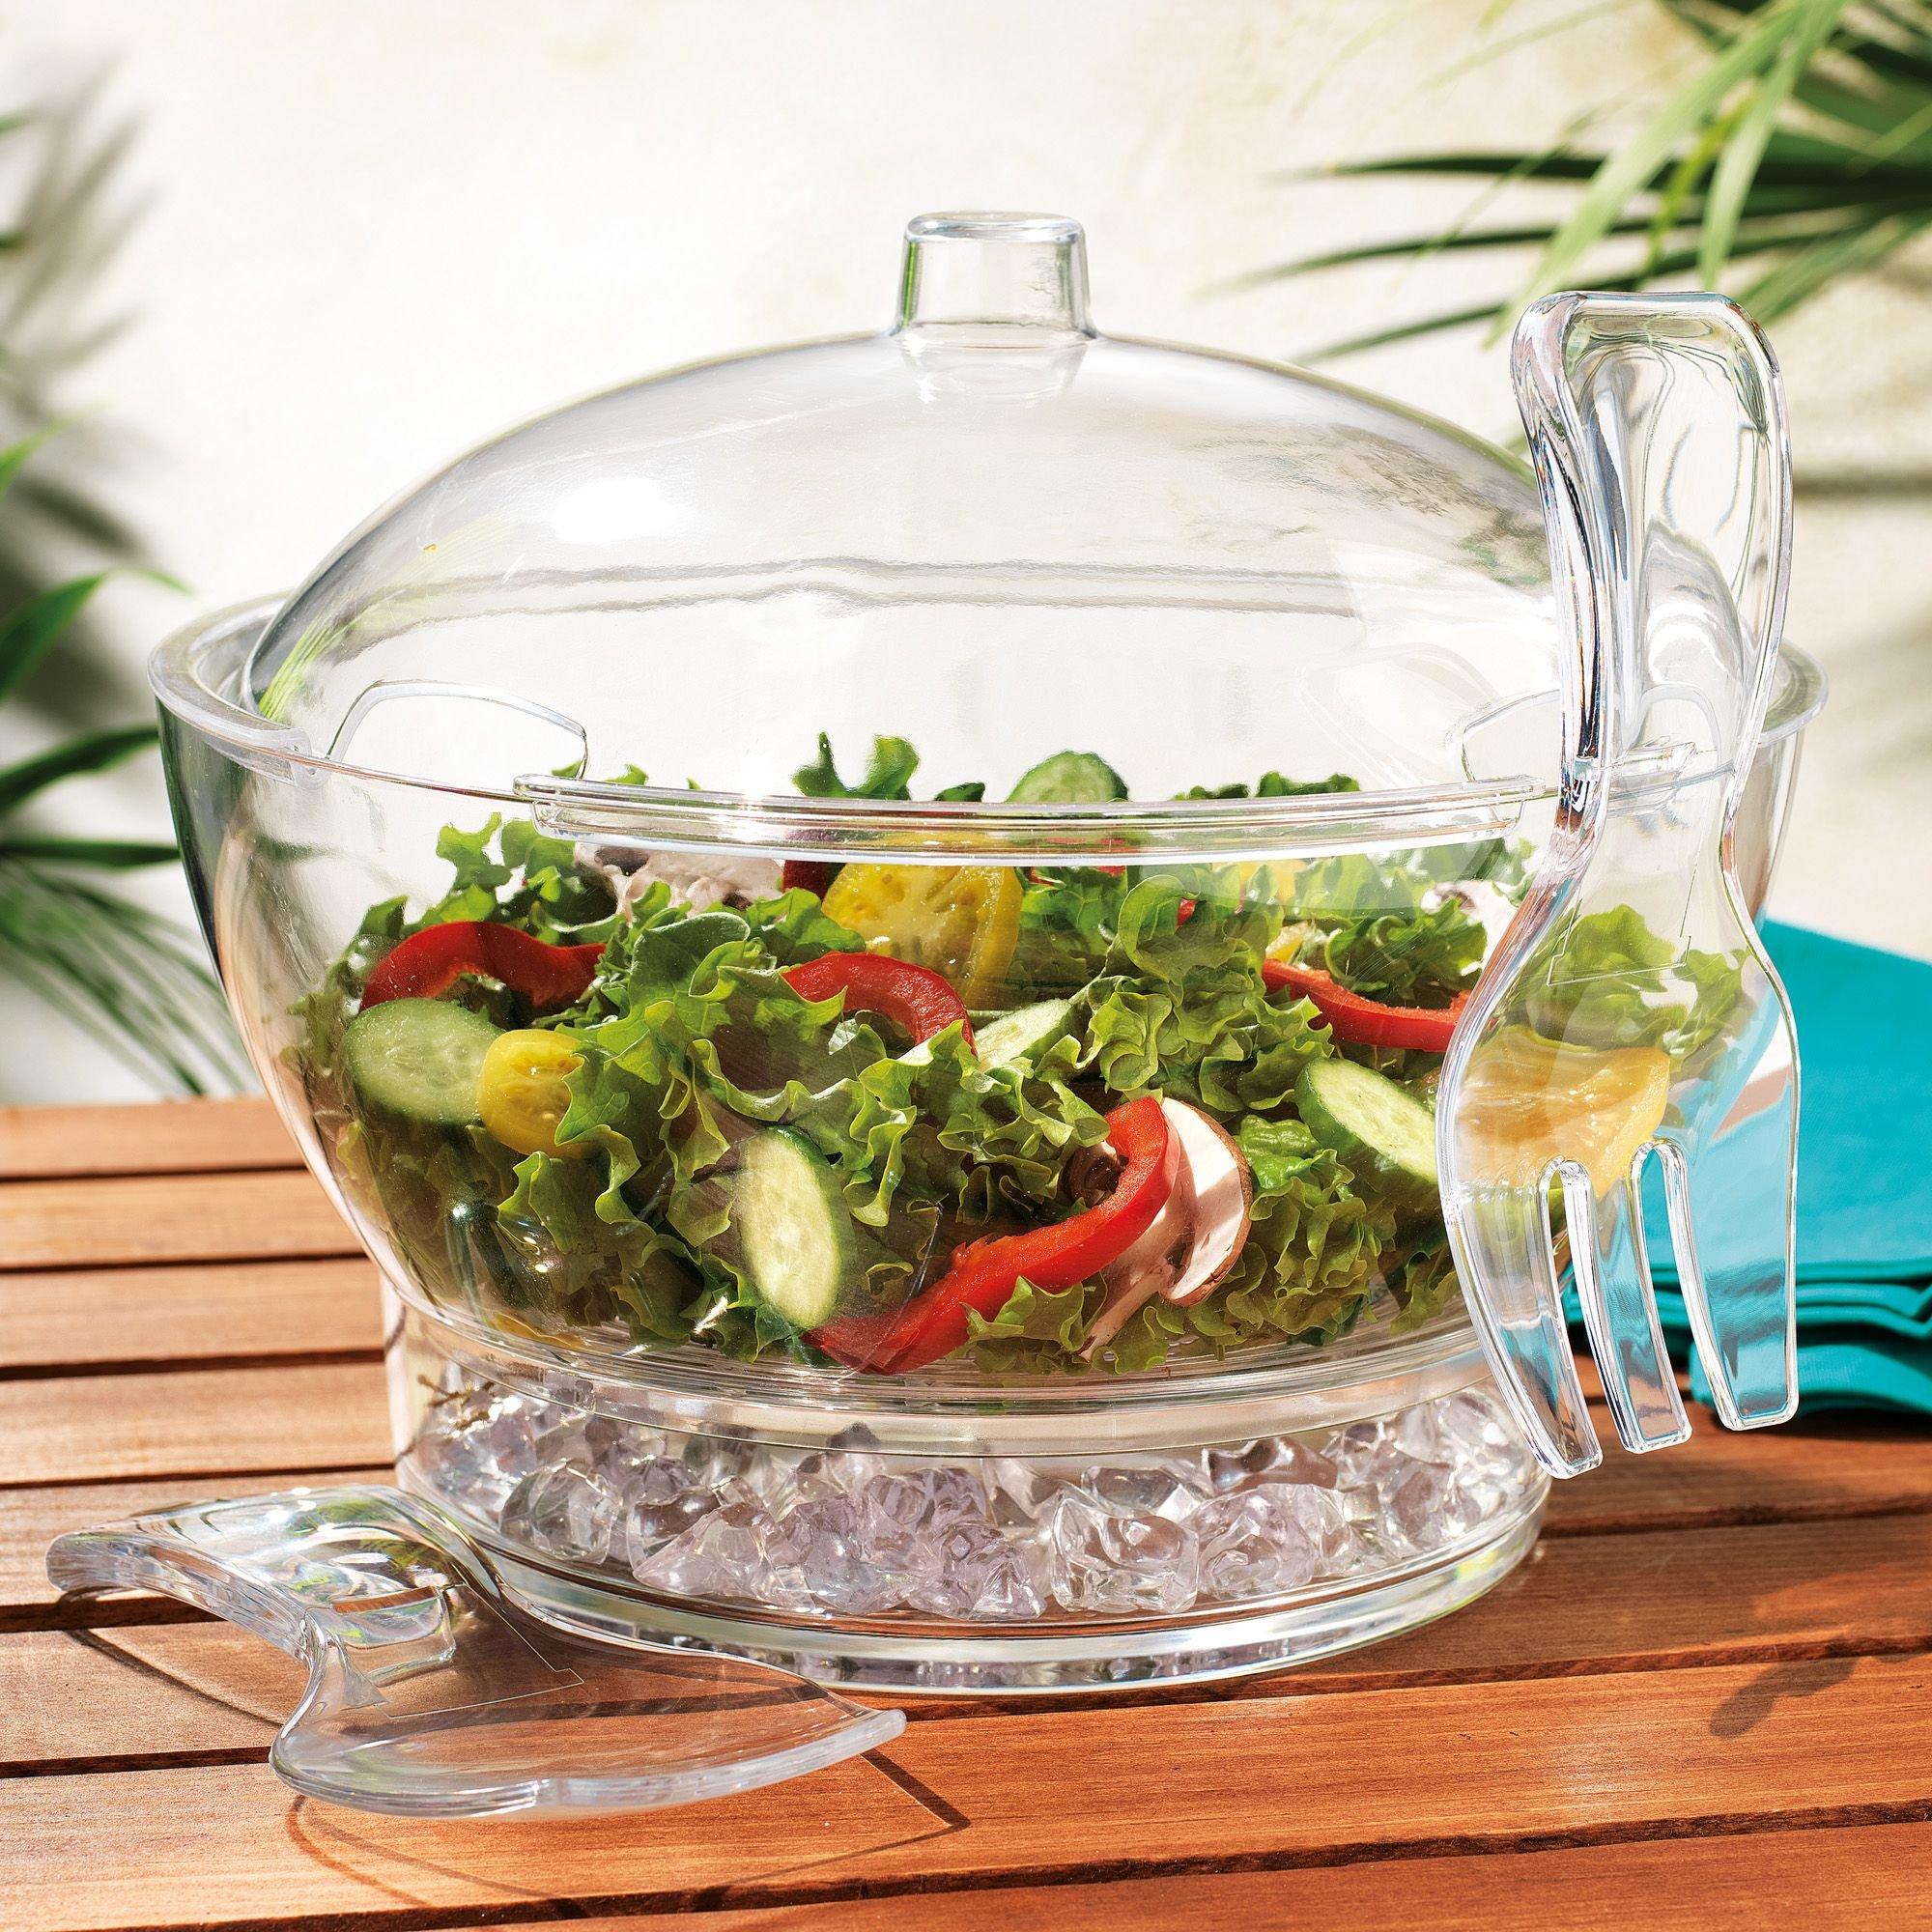 Elegant Home l Salad Bowl Chilled-Serve 6 piece Serve Set With Ice tray| Dome Lid & Serving Utensils